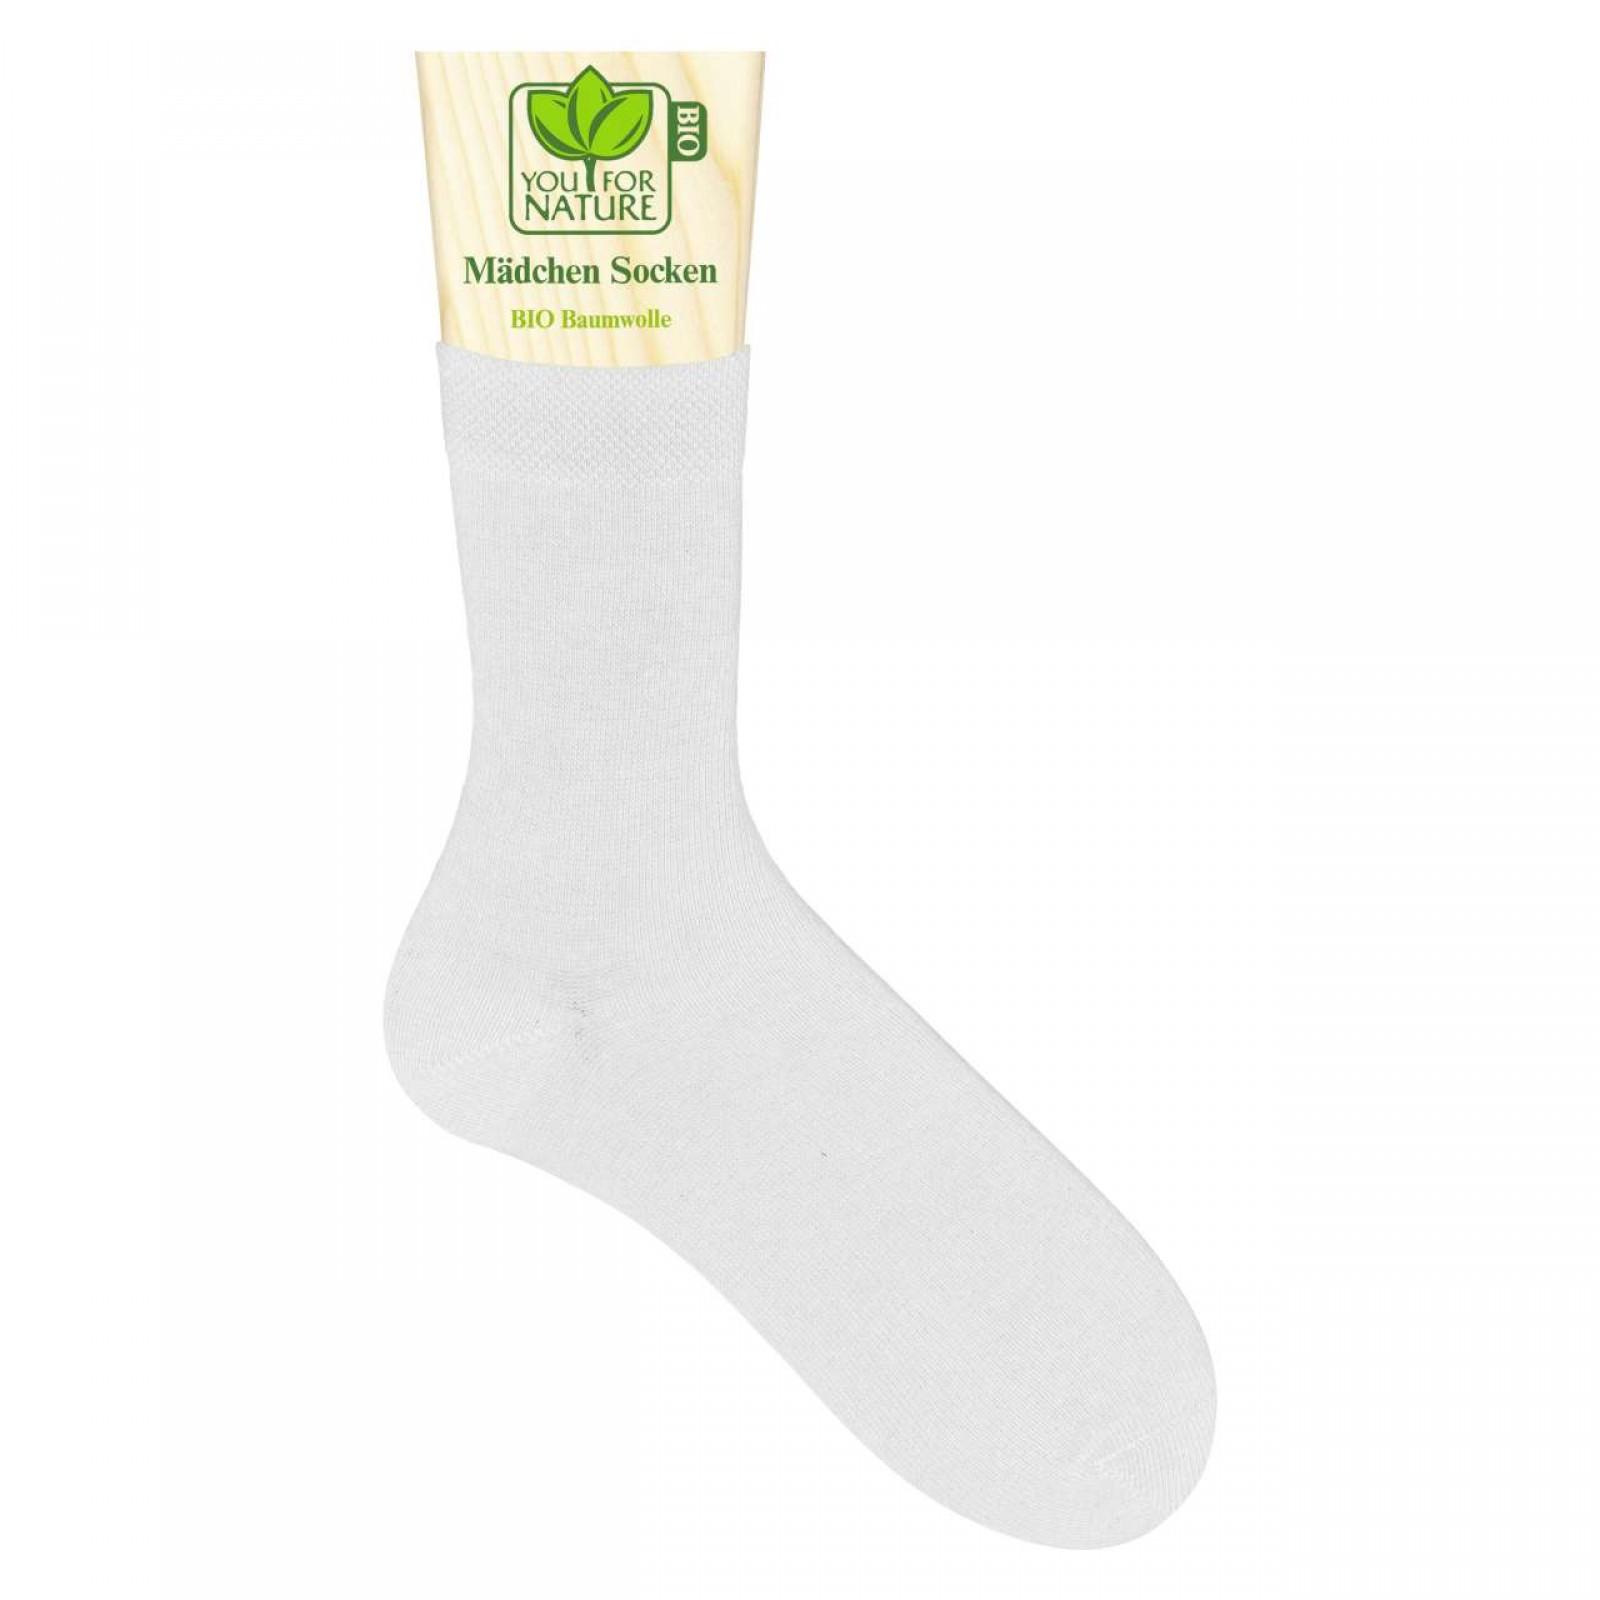 Mädchen Socken/Strümpfe BIO Baumwolle | Kinder | YOU FOR NATURE